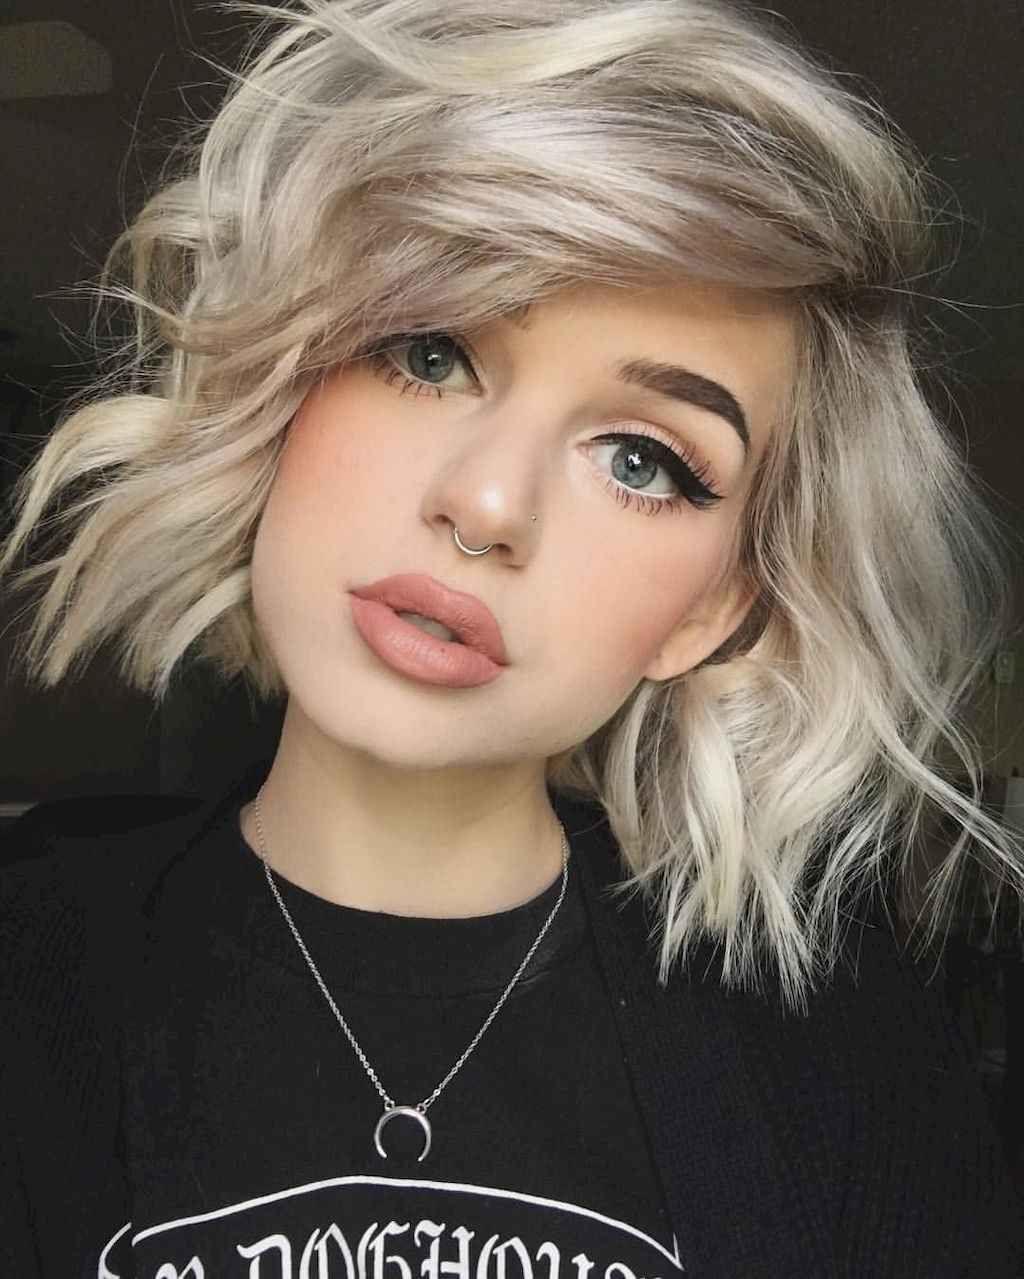 45 Messy Short Hair For Pretty Girls Messy Short Hair Cute Hairstyles For Short Hair Short Hair Styles